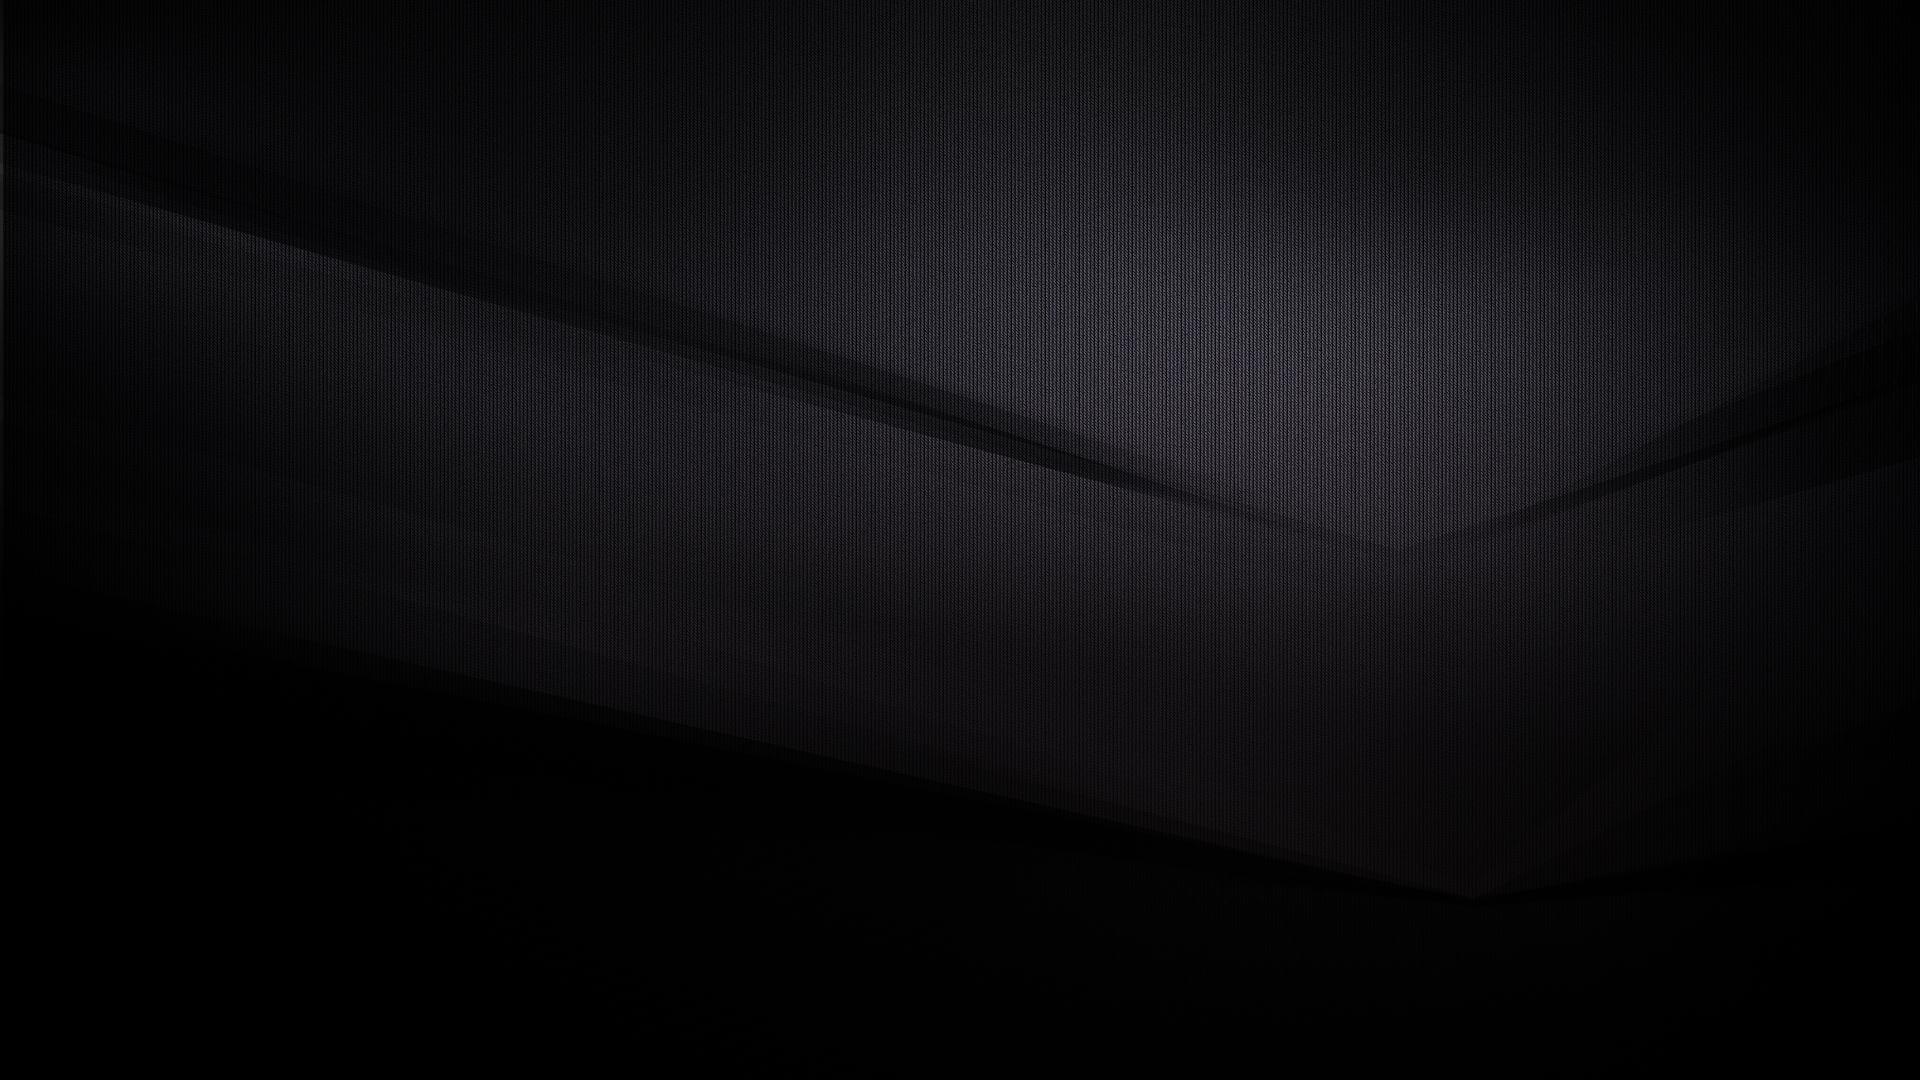 Abstract - Dark Wallpaper